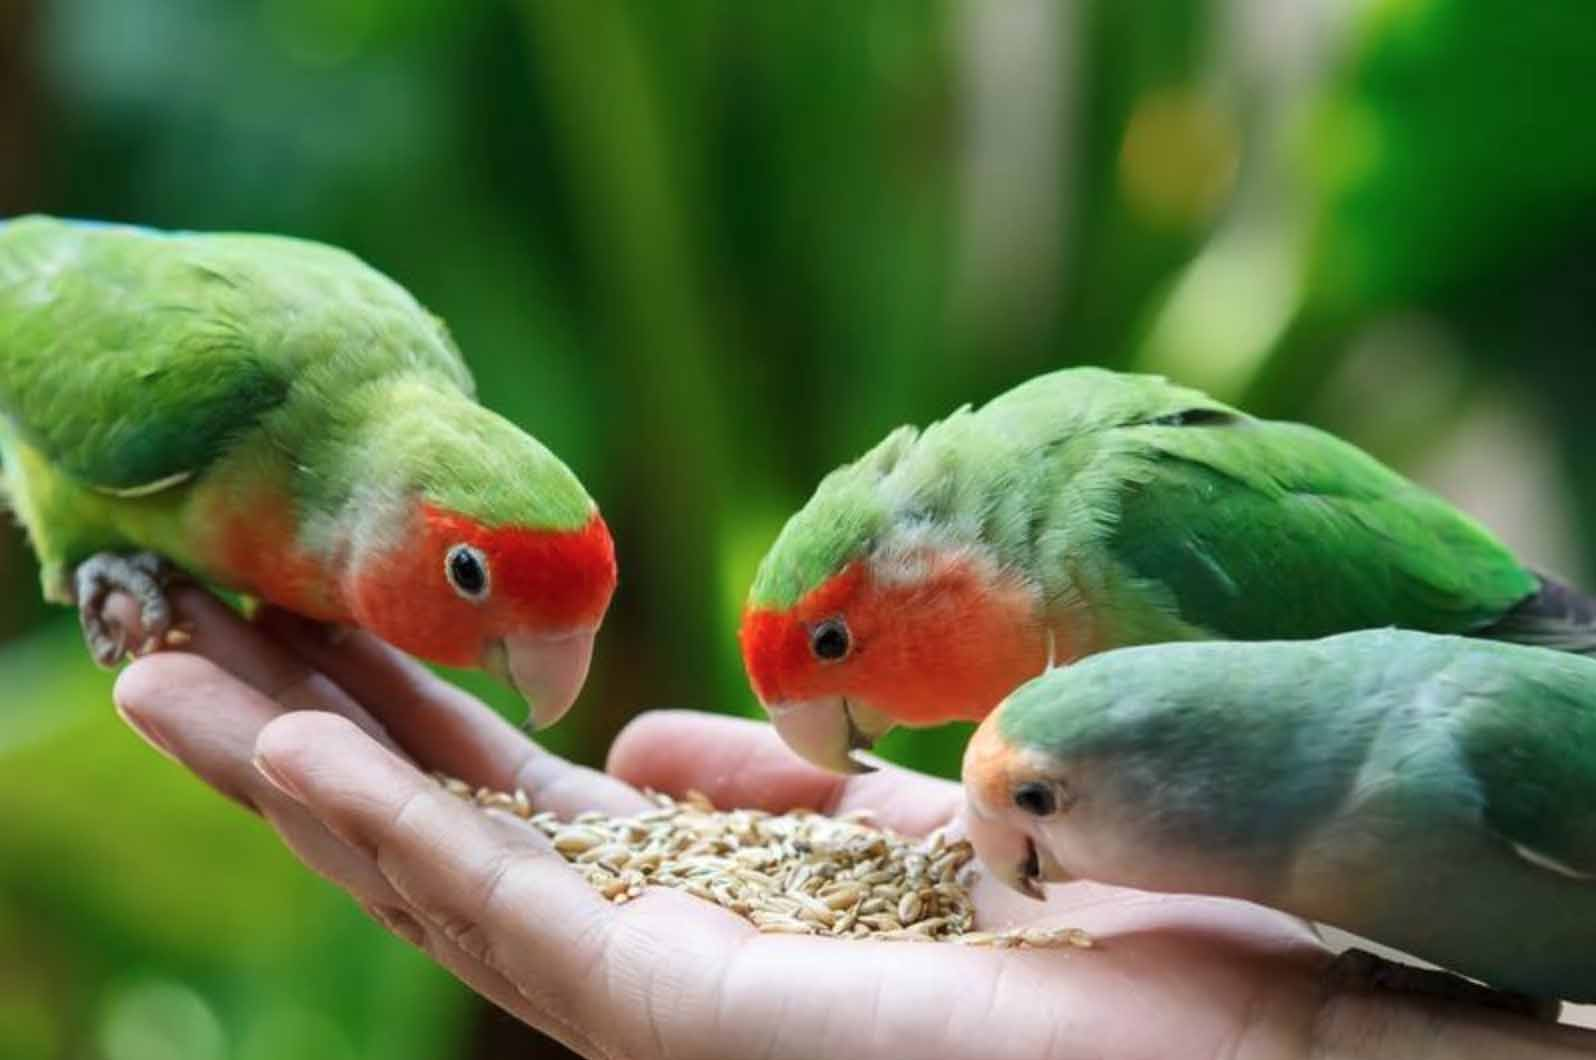 Kasih makan burung Lovebird